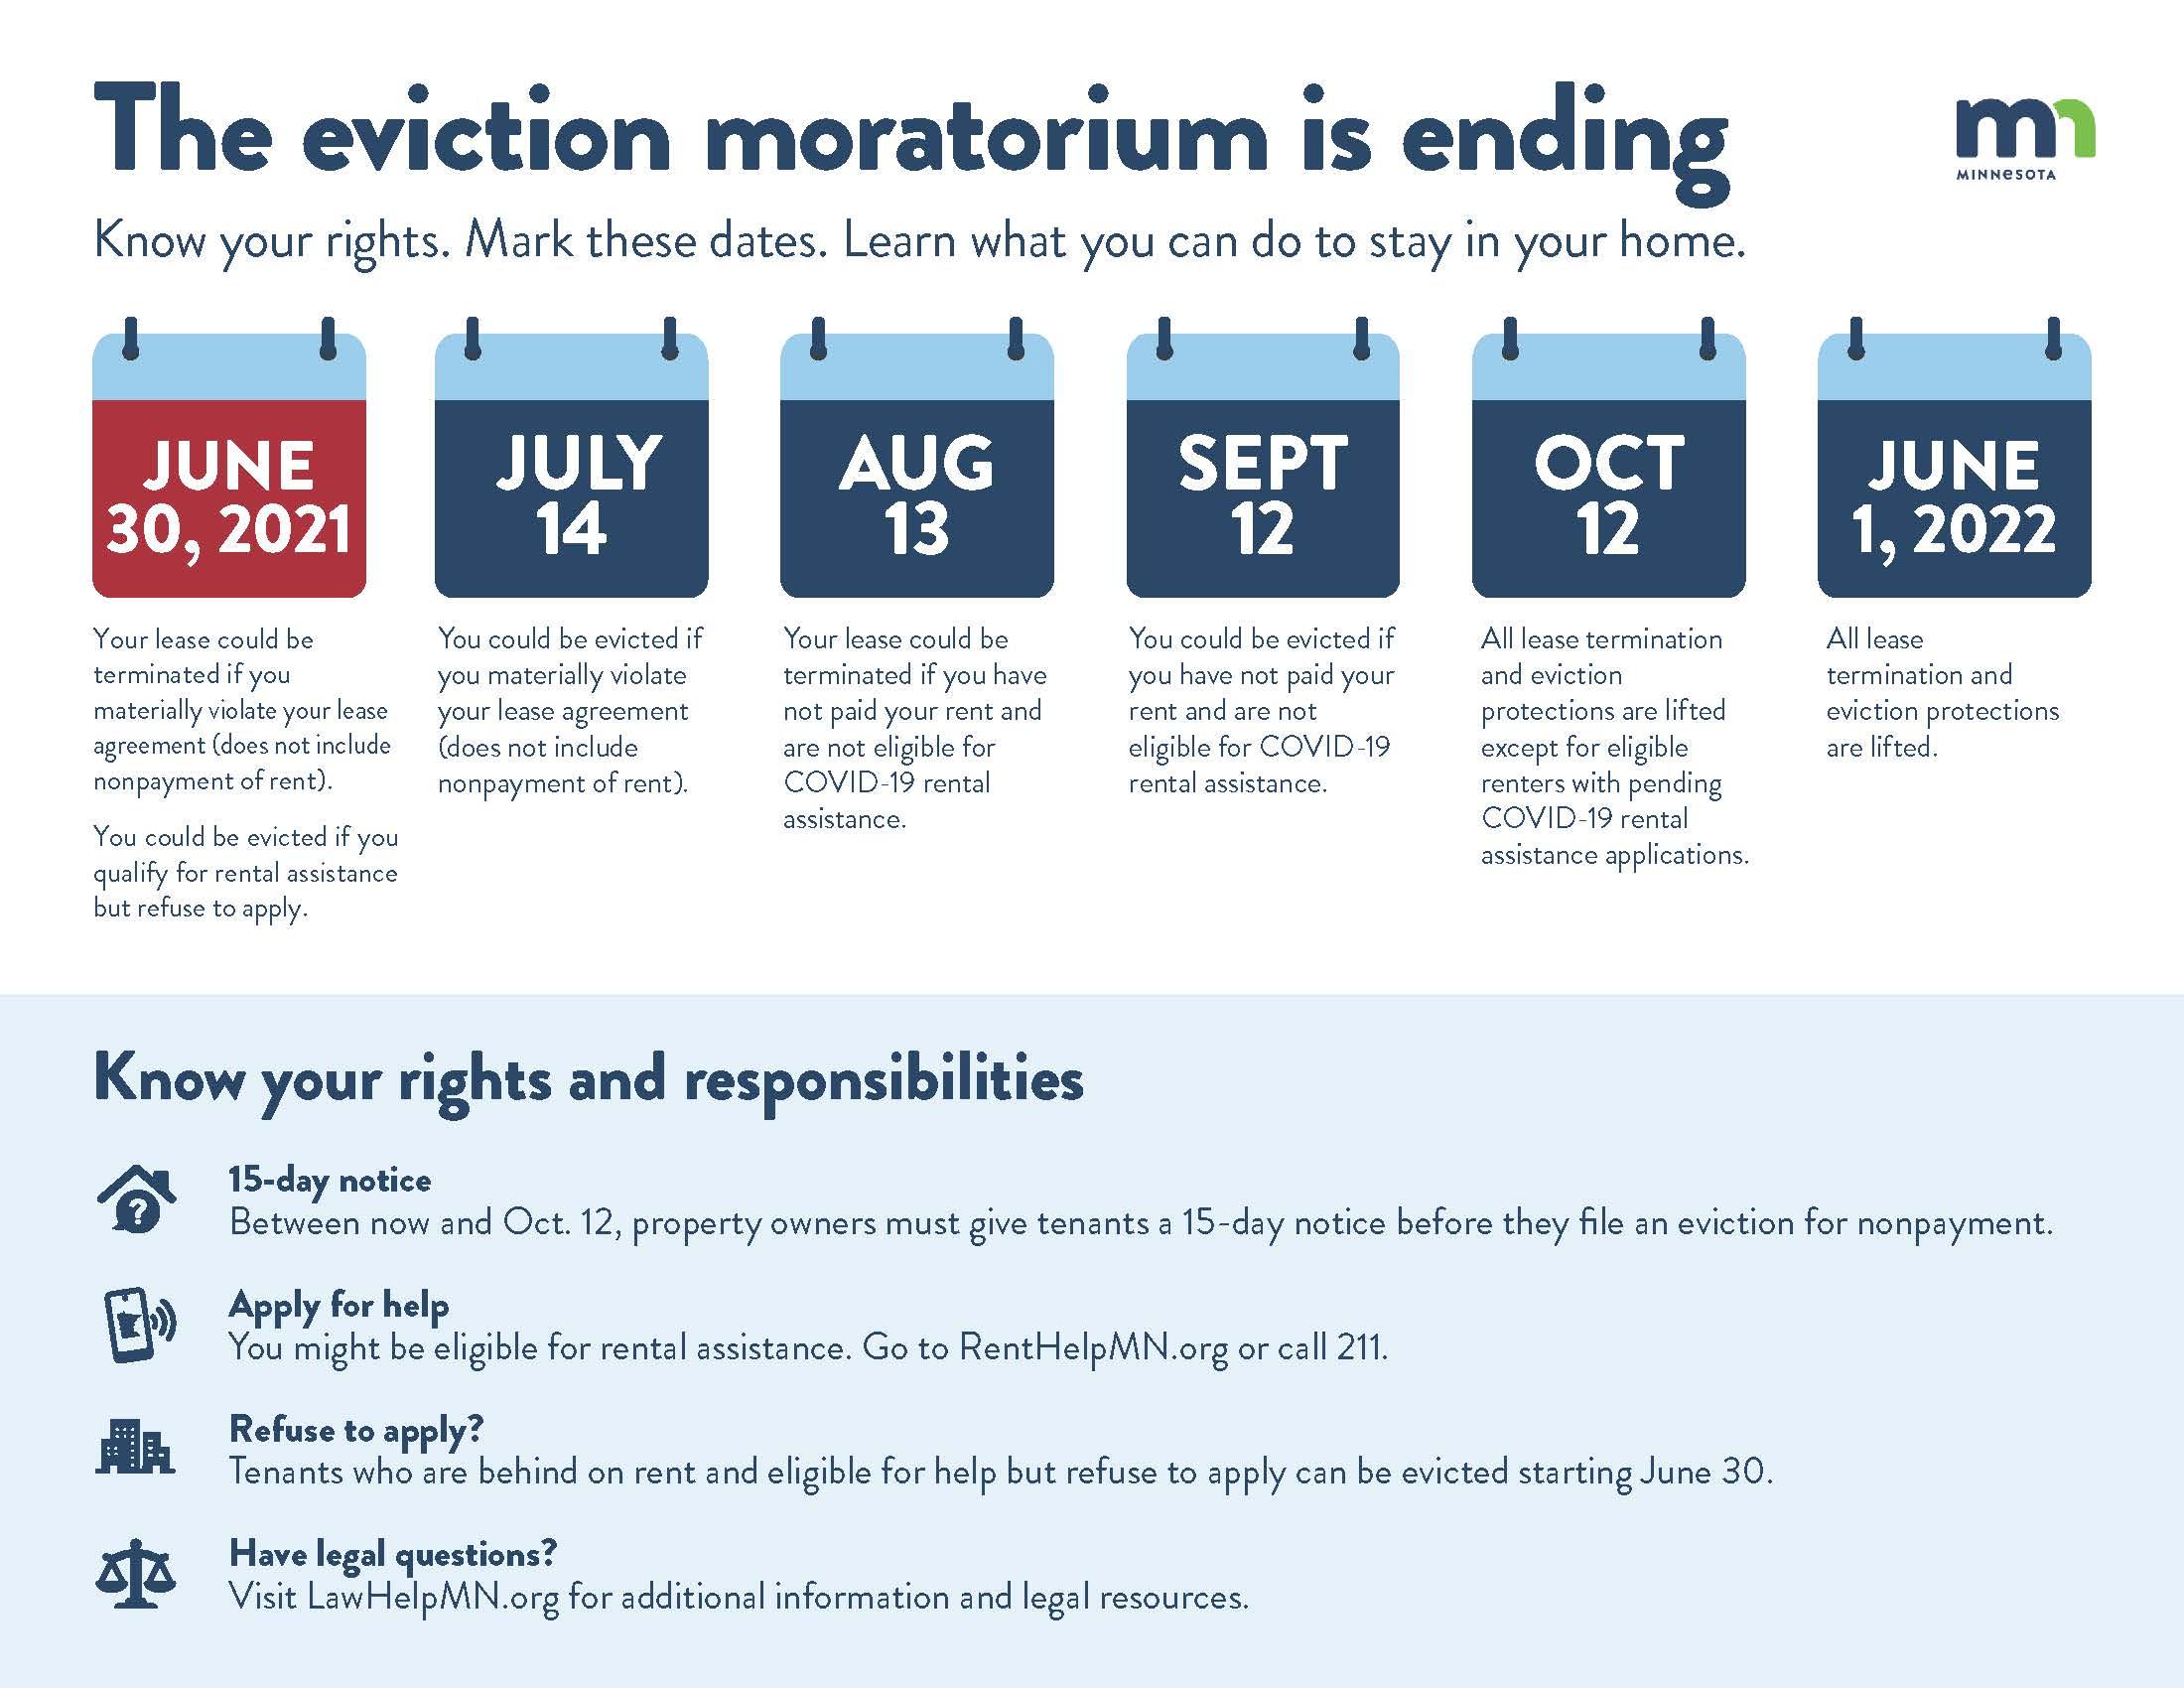 Eviction moratorium is ending